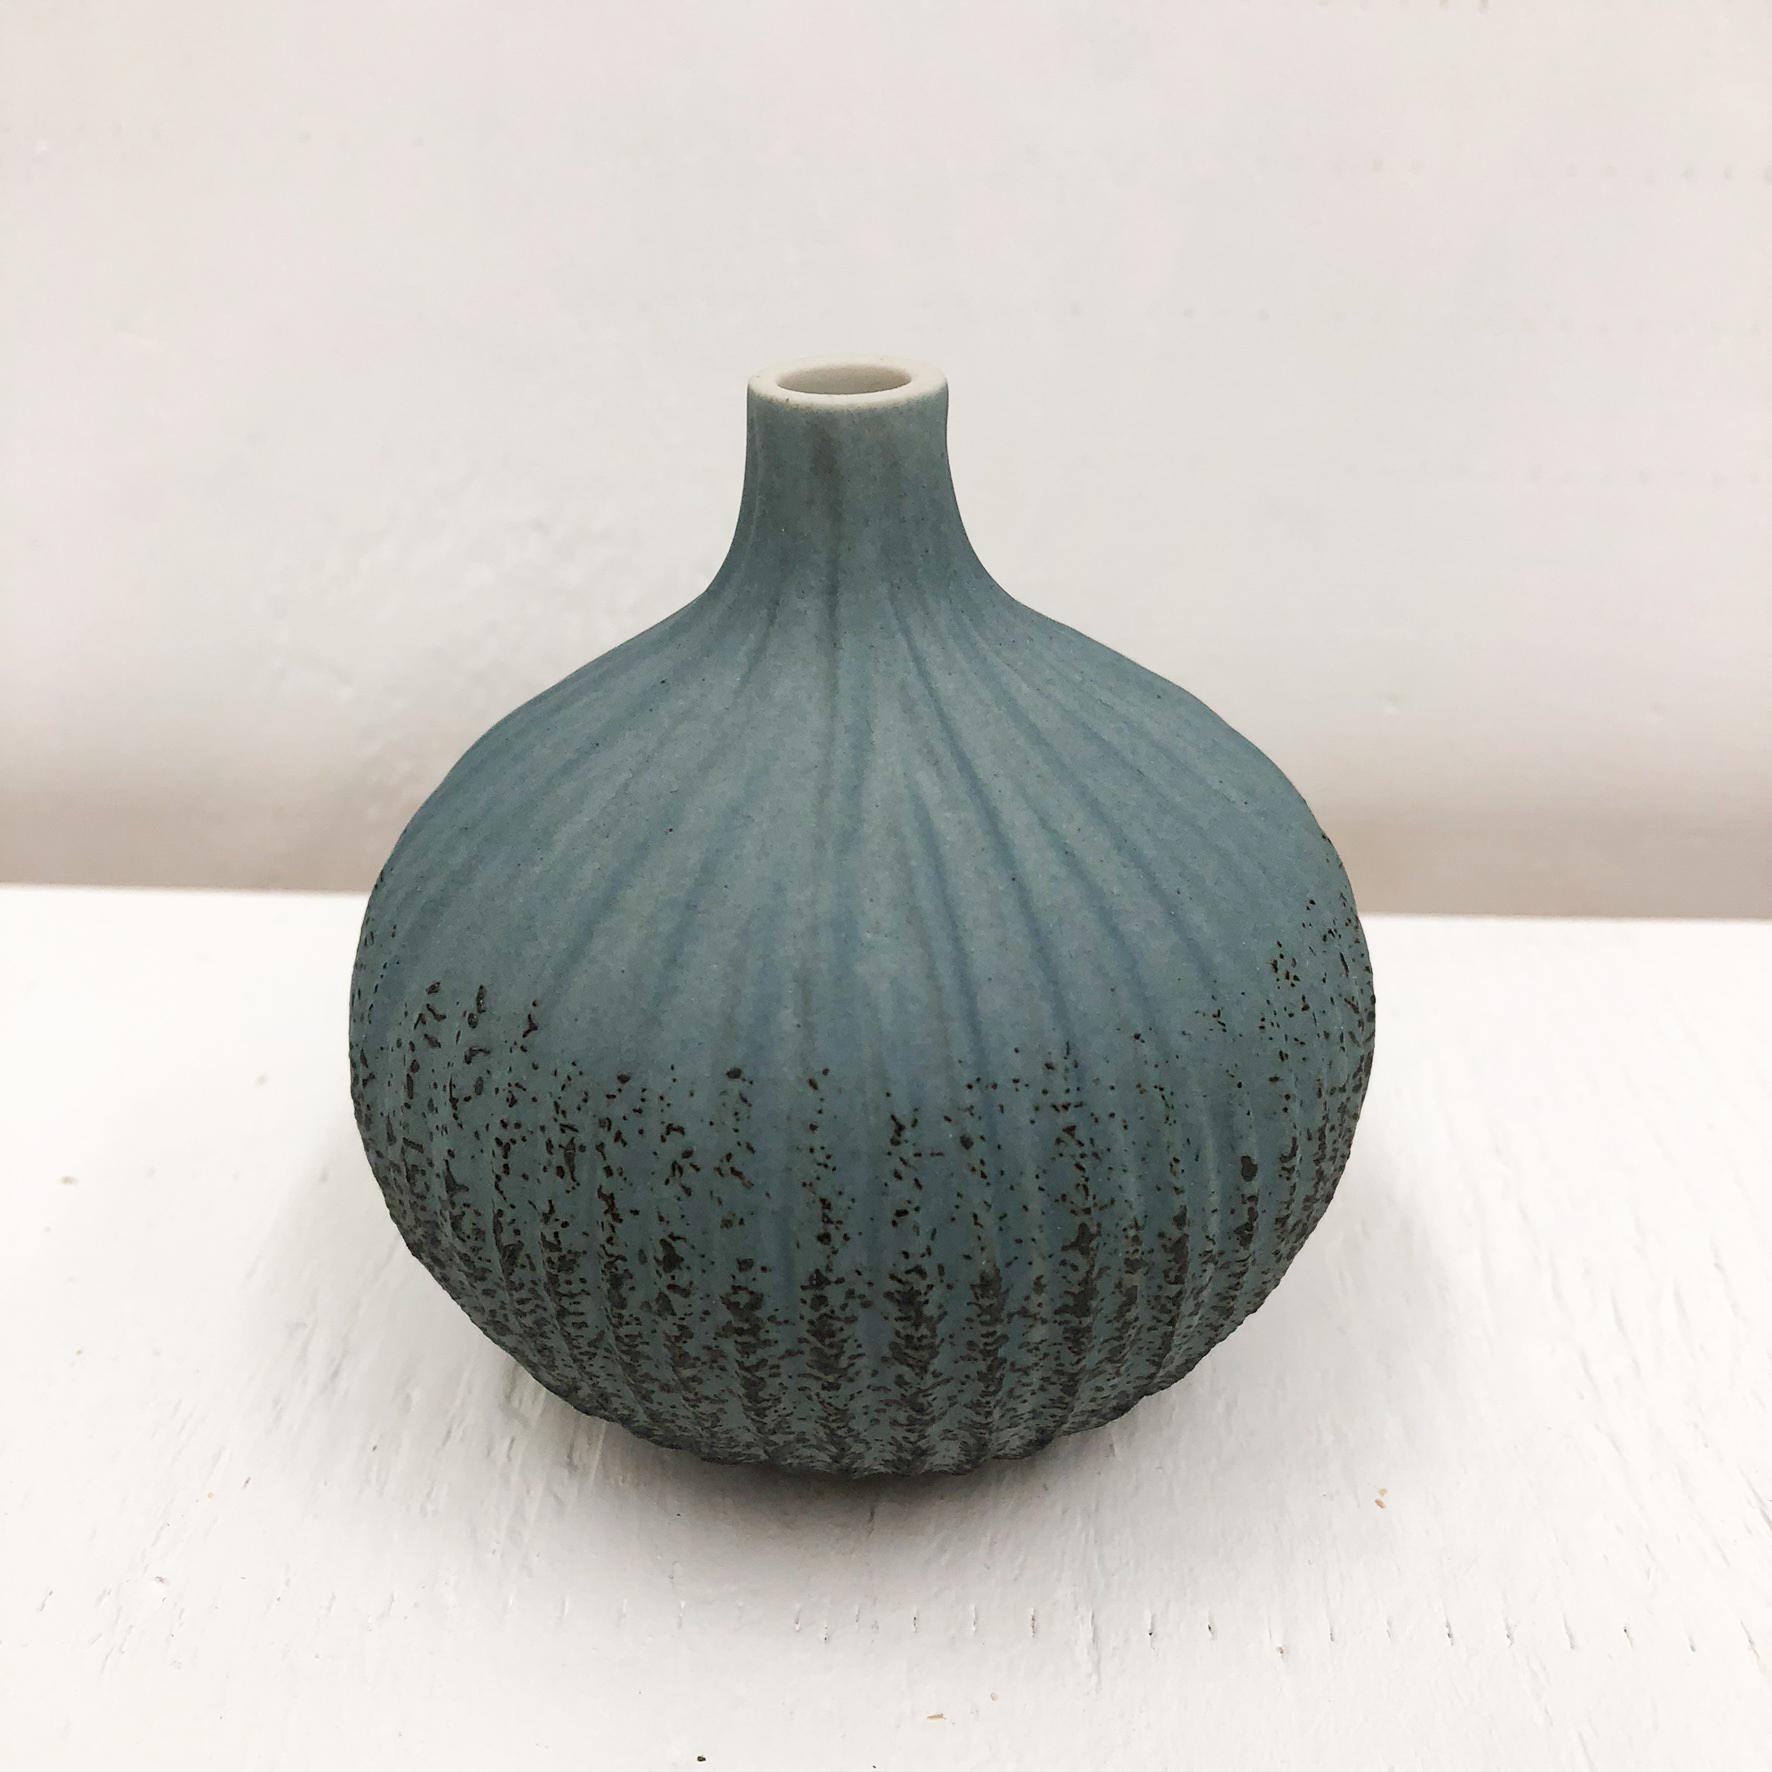 Congo Tiny L Handmade Vase - Blue